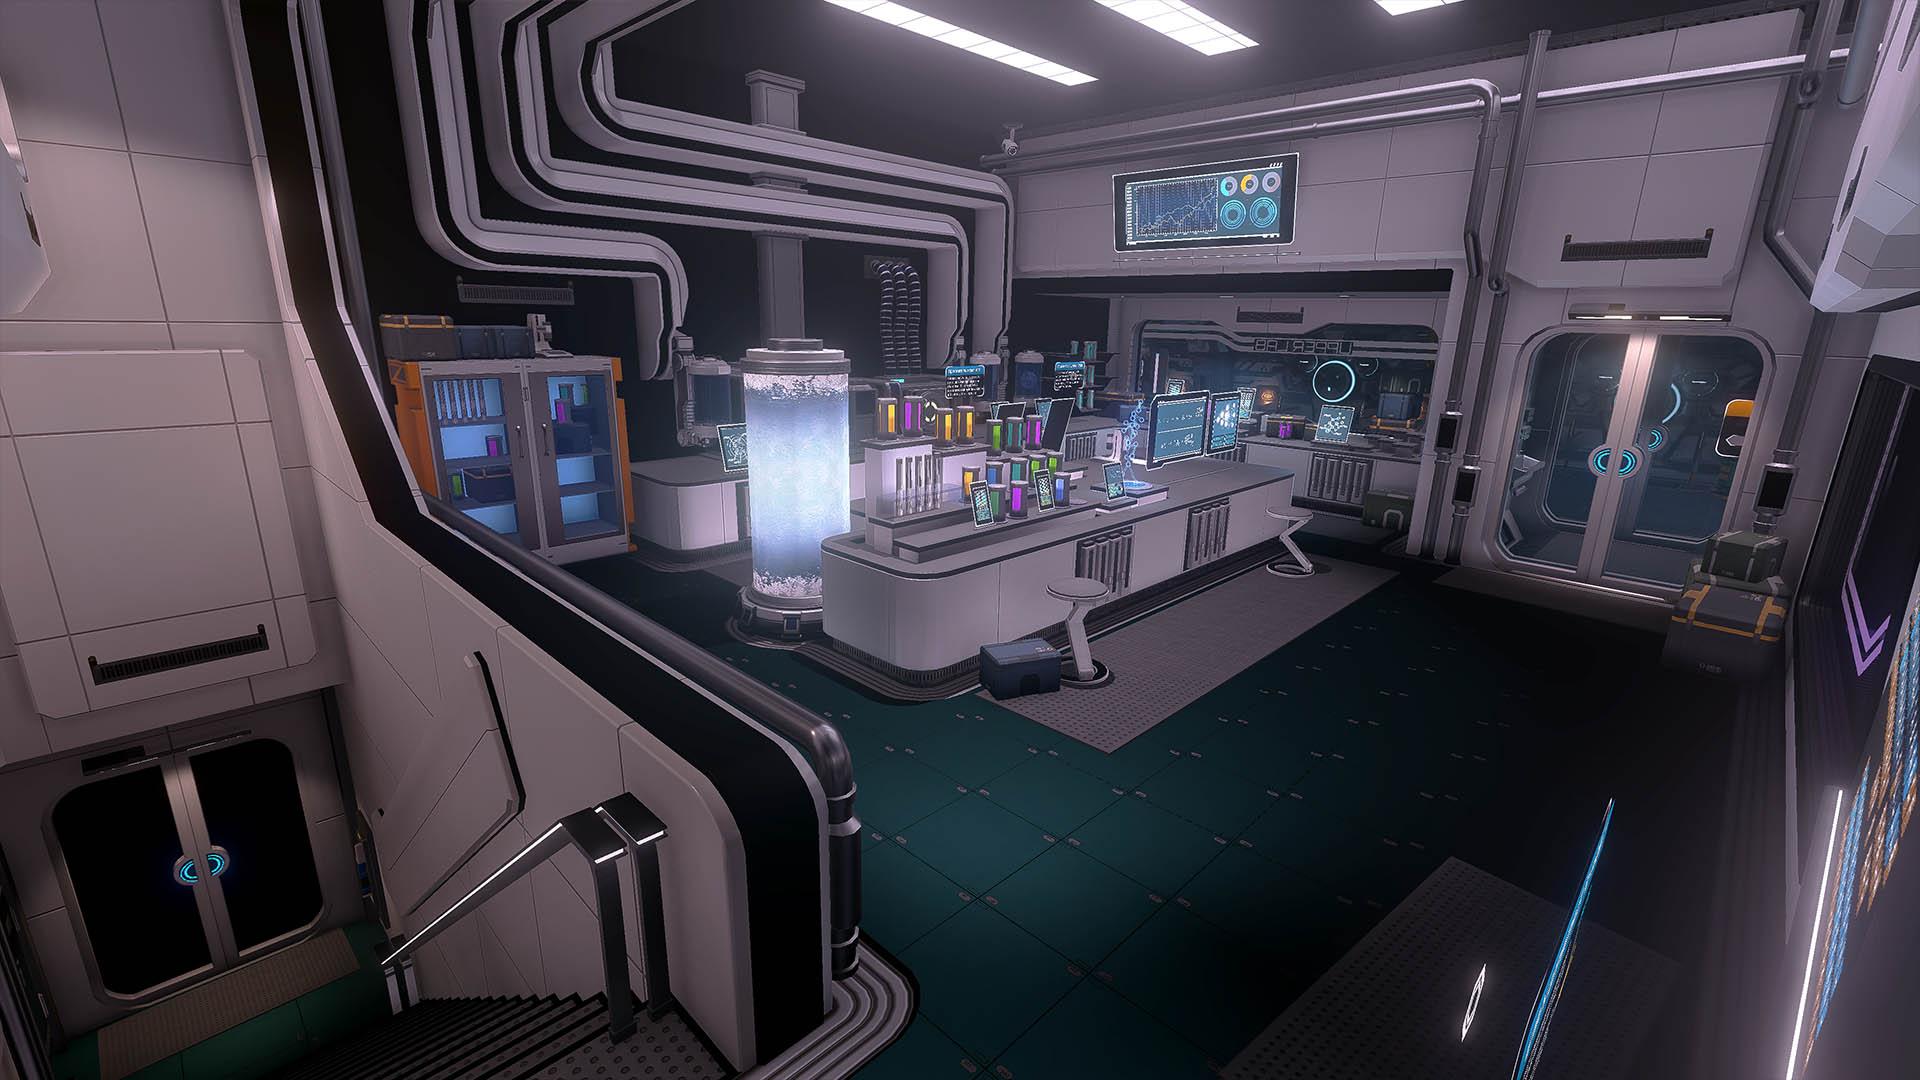 The Station скриншот 7